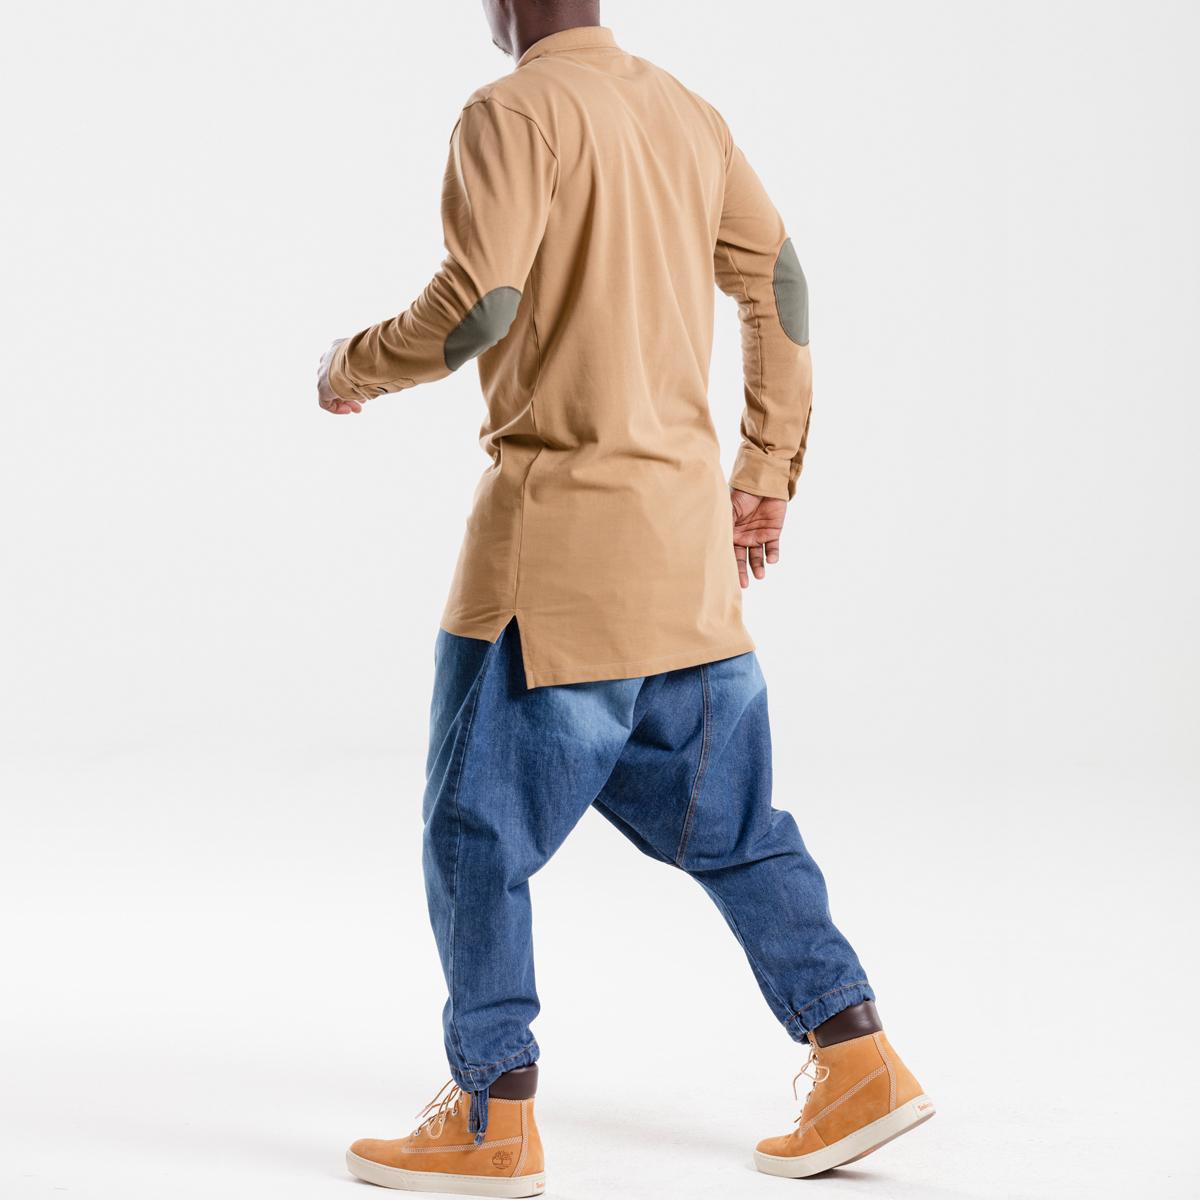 saroual jeans evo light used dcjeans ensemble dos